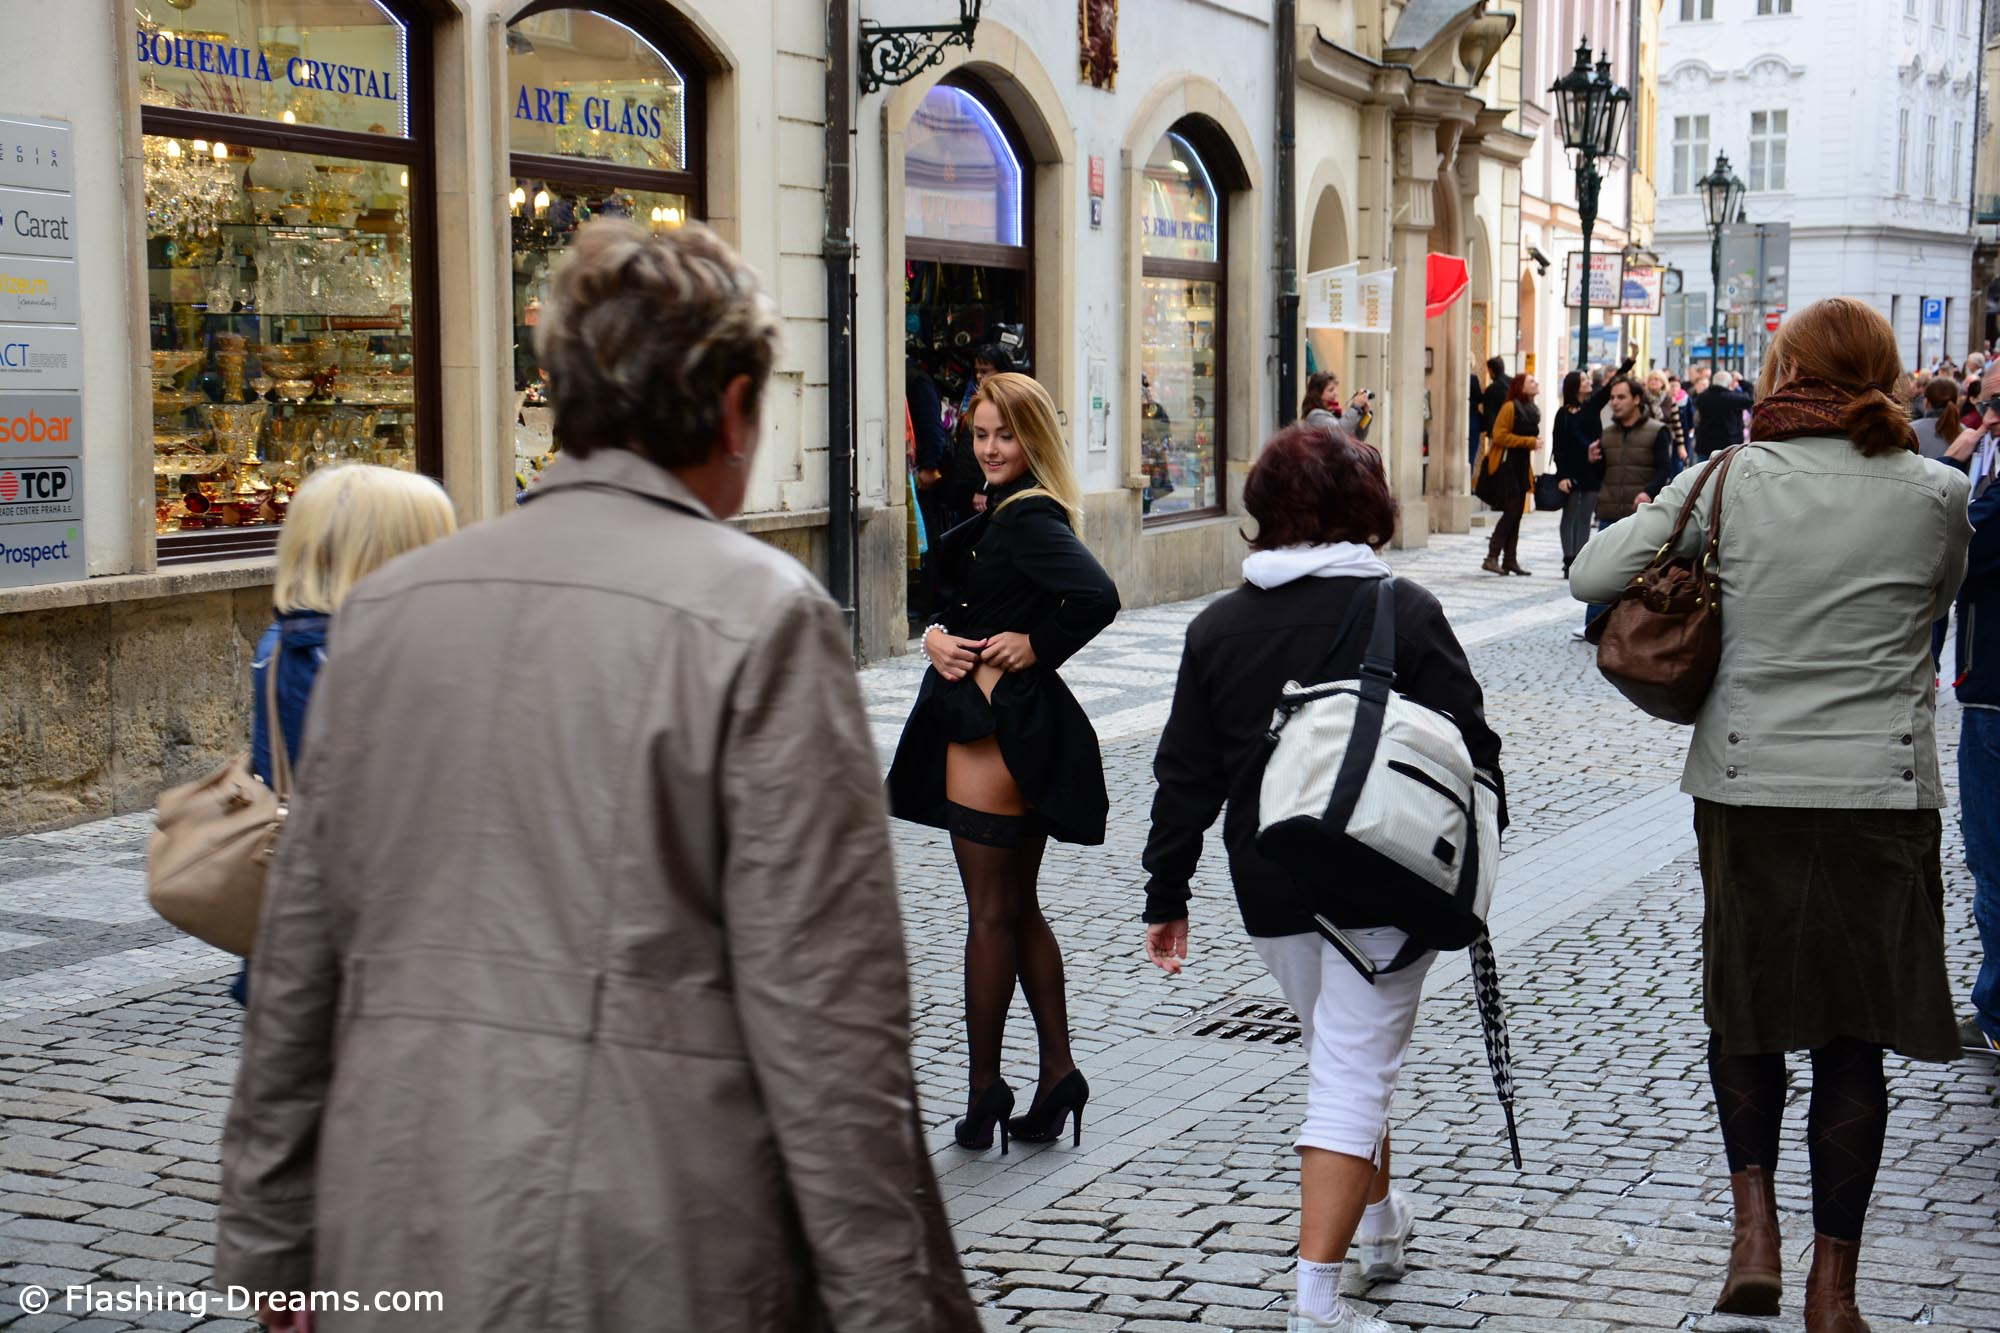 eva-kerstin-blonde-stockings-flash-in-public-nude-prague-34